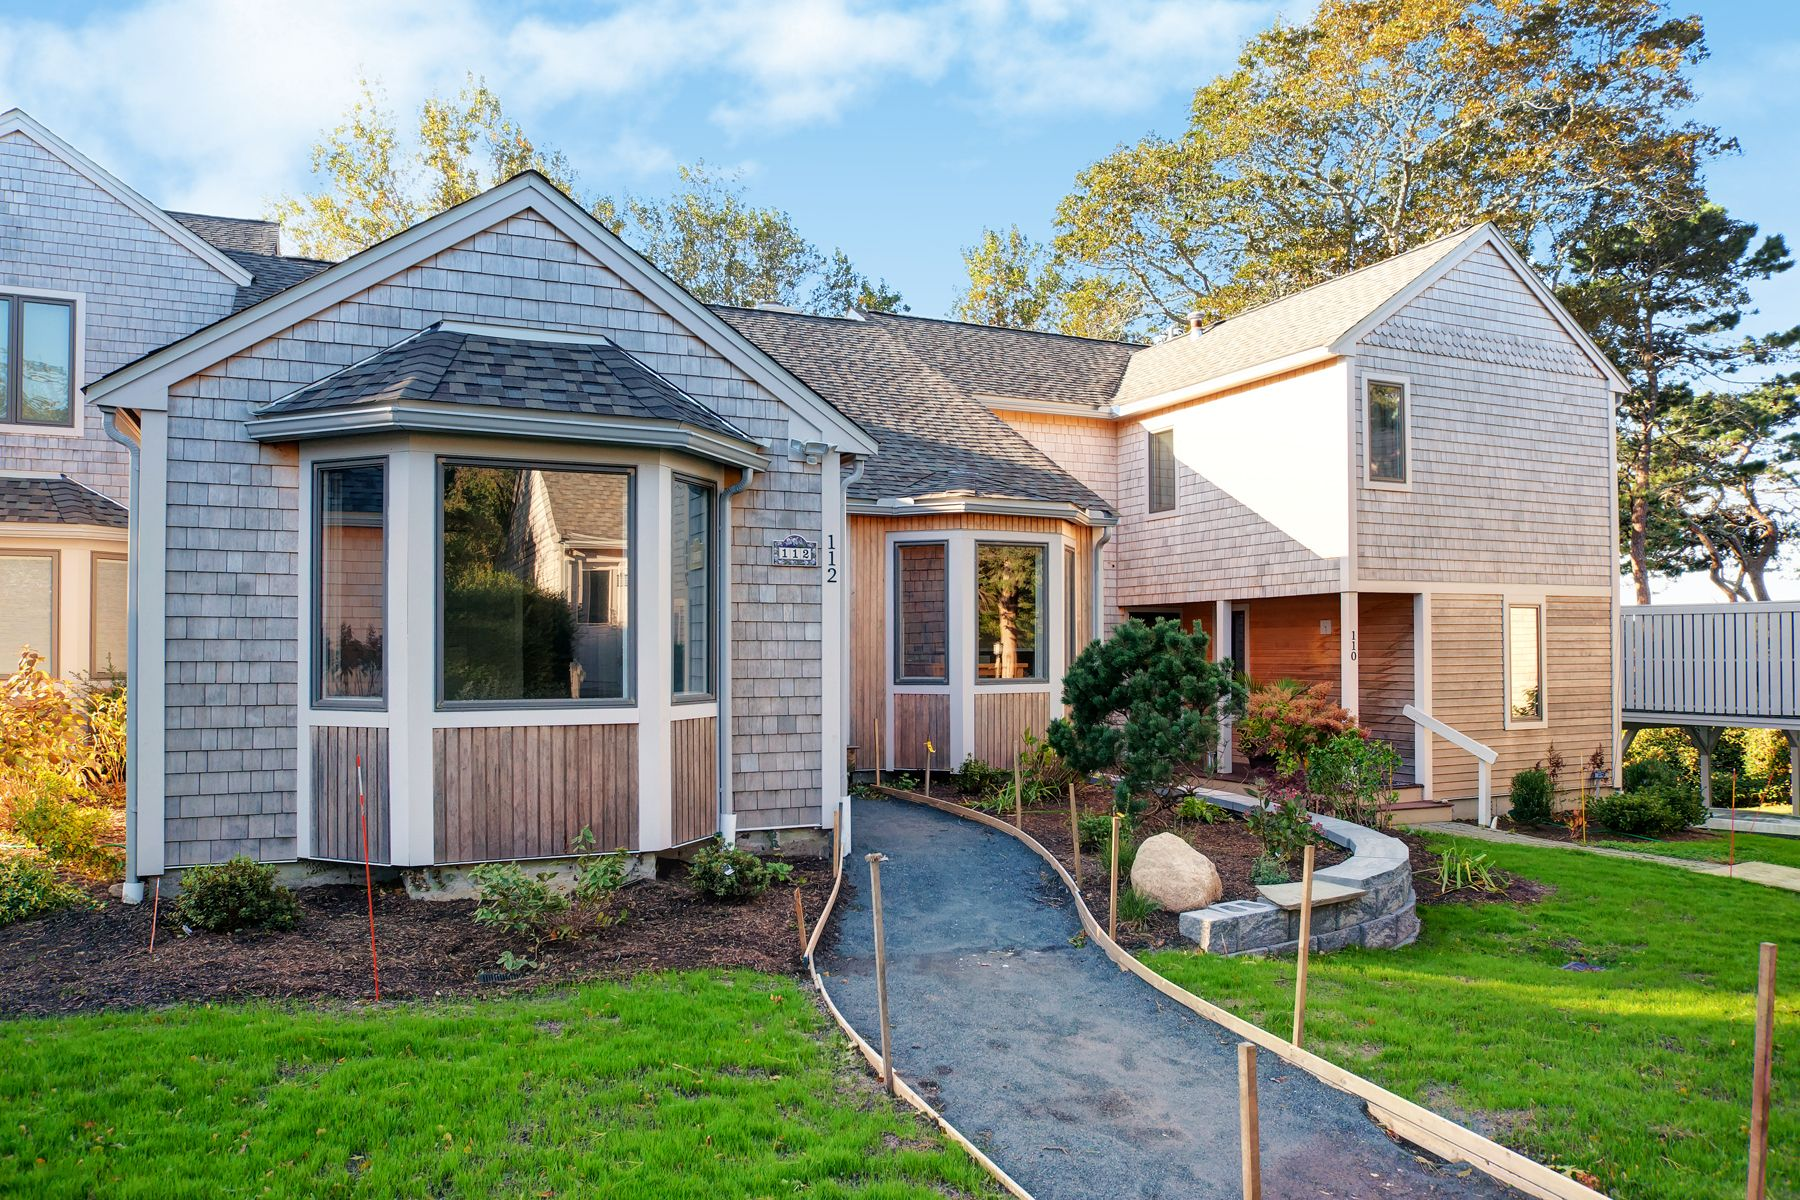 Condominiums 为 销售 在 112 Ships Watch 法尔茅斯, 马萨诸塞州 02540 美国